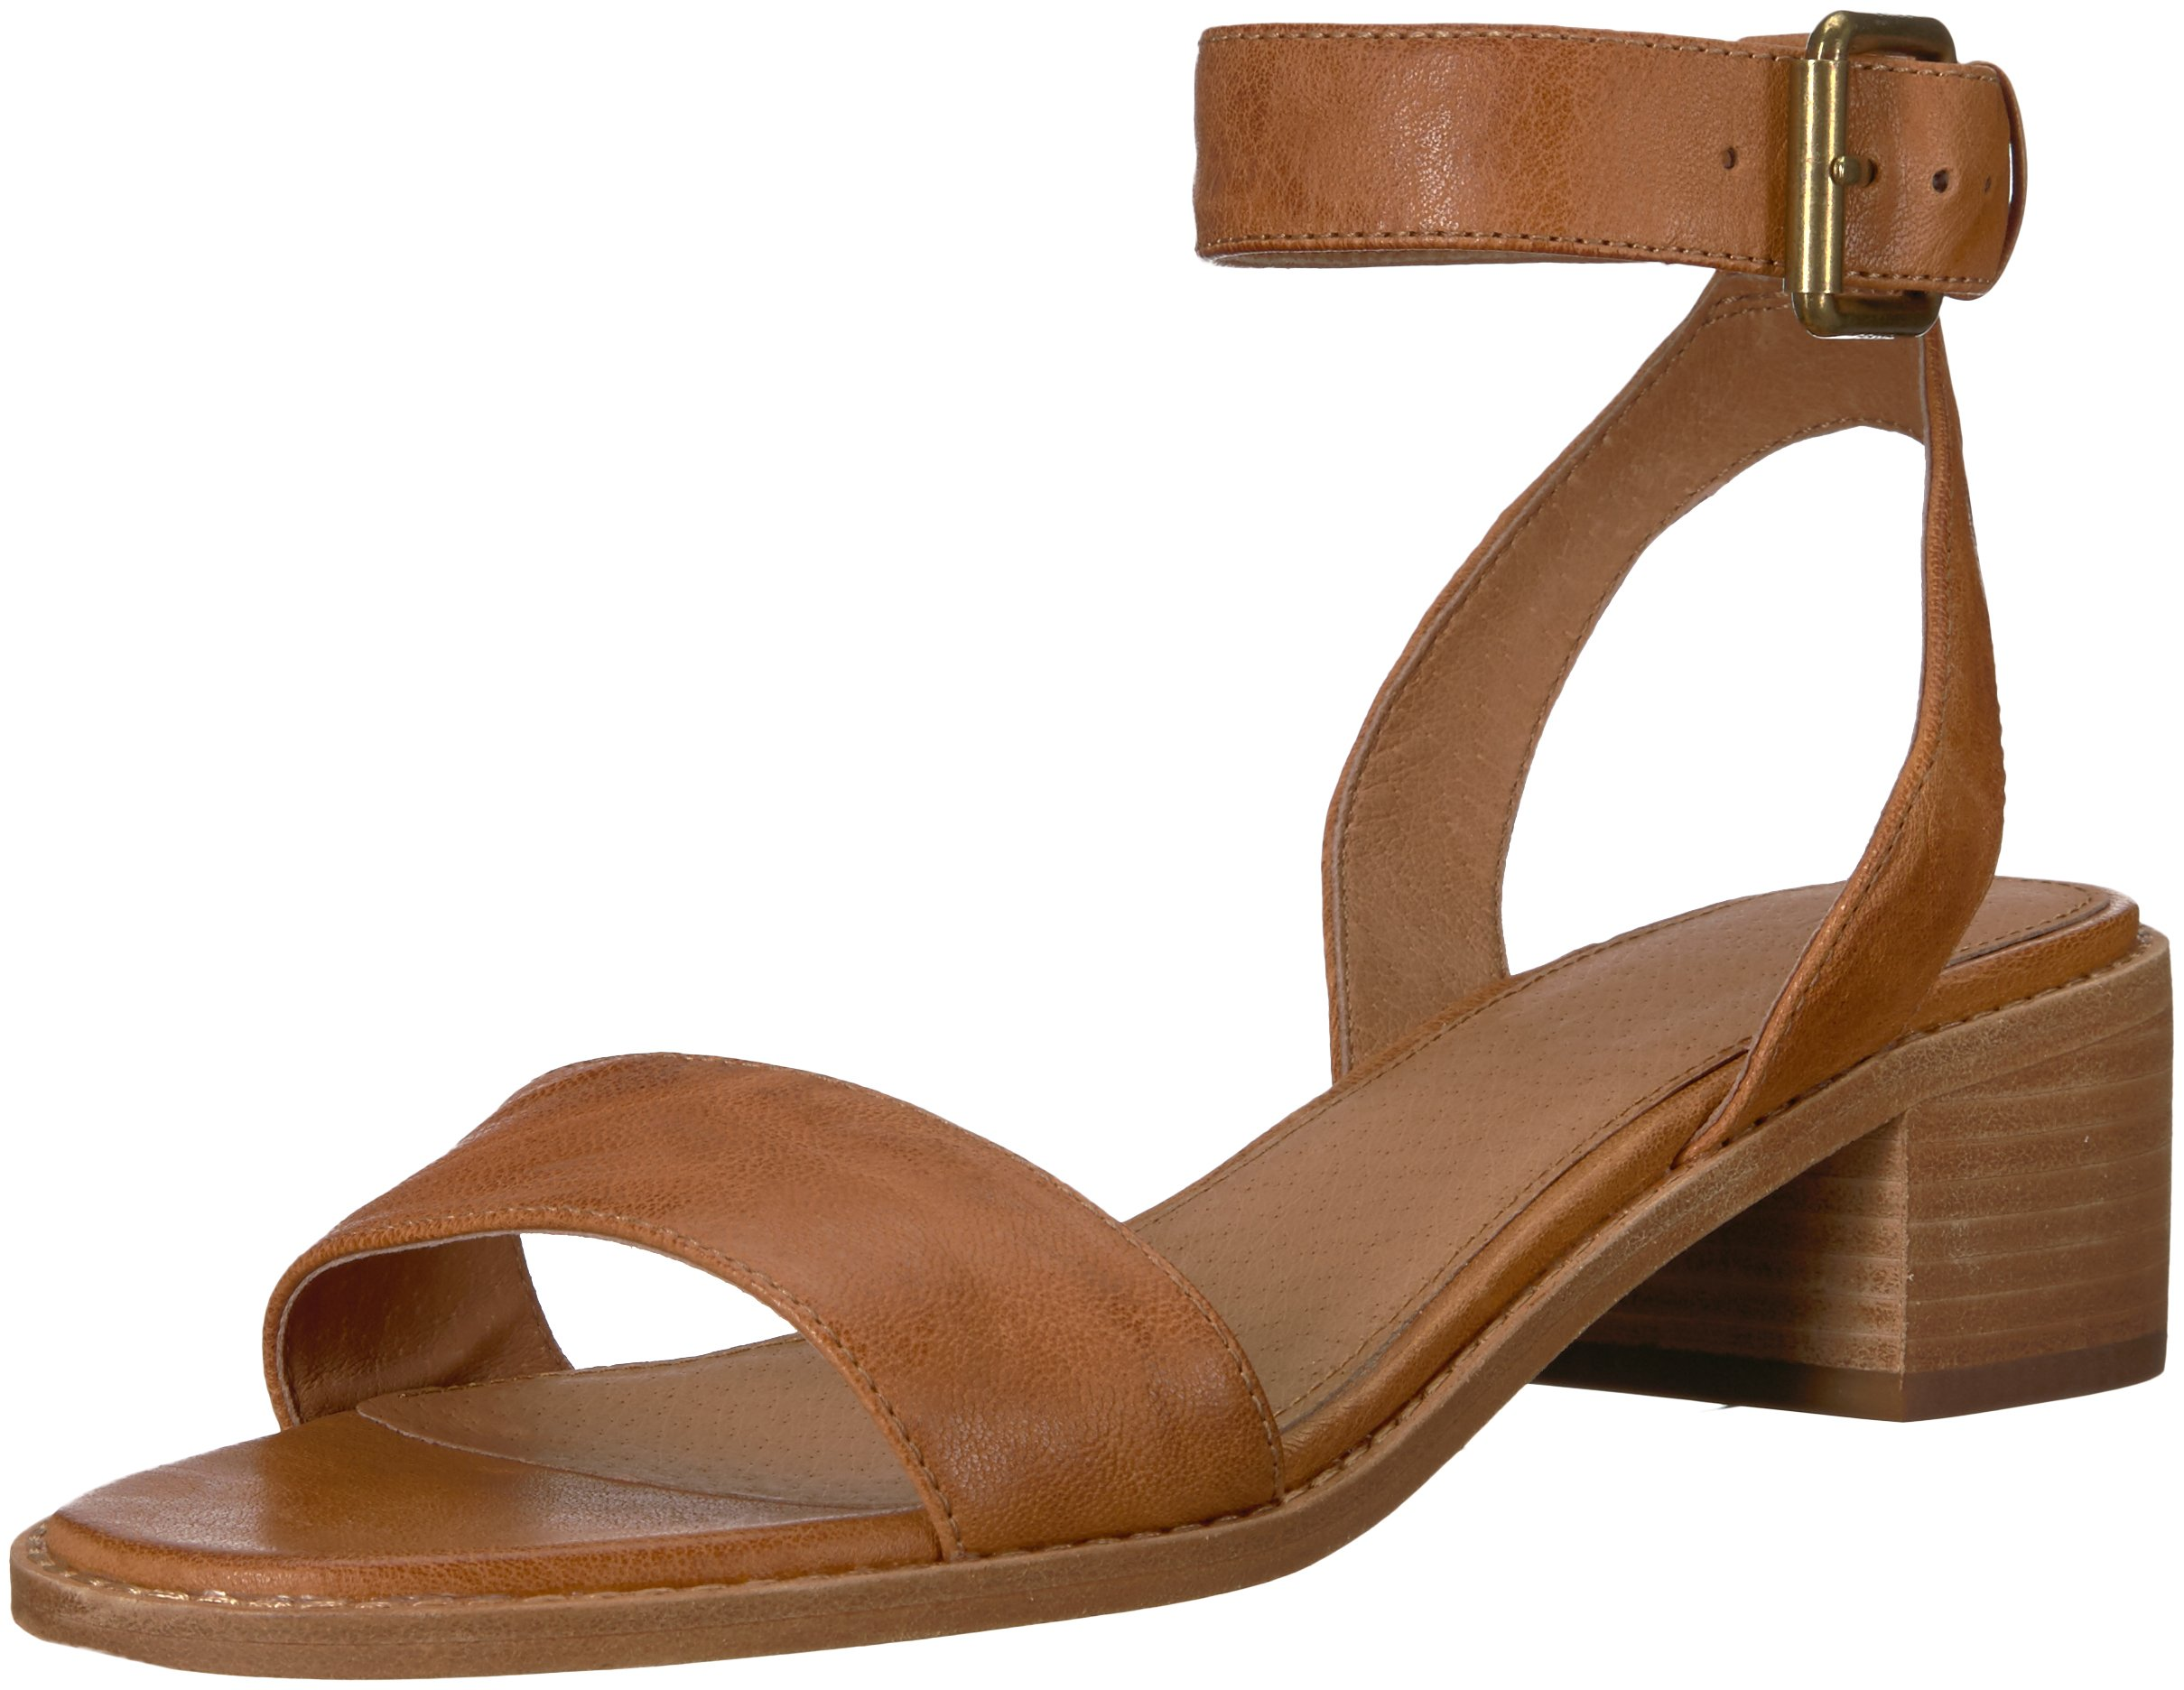 FRYE Women's Cindy 2 Piece Heeled Sandal, Camel, 9.5 M US